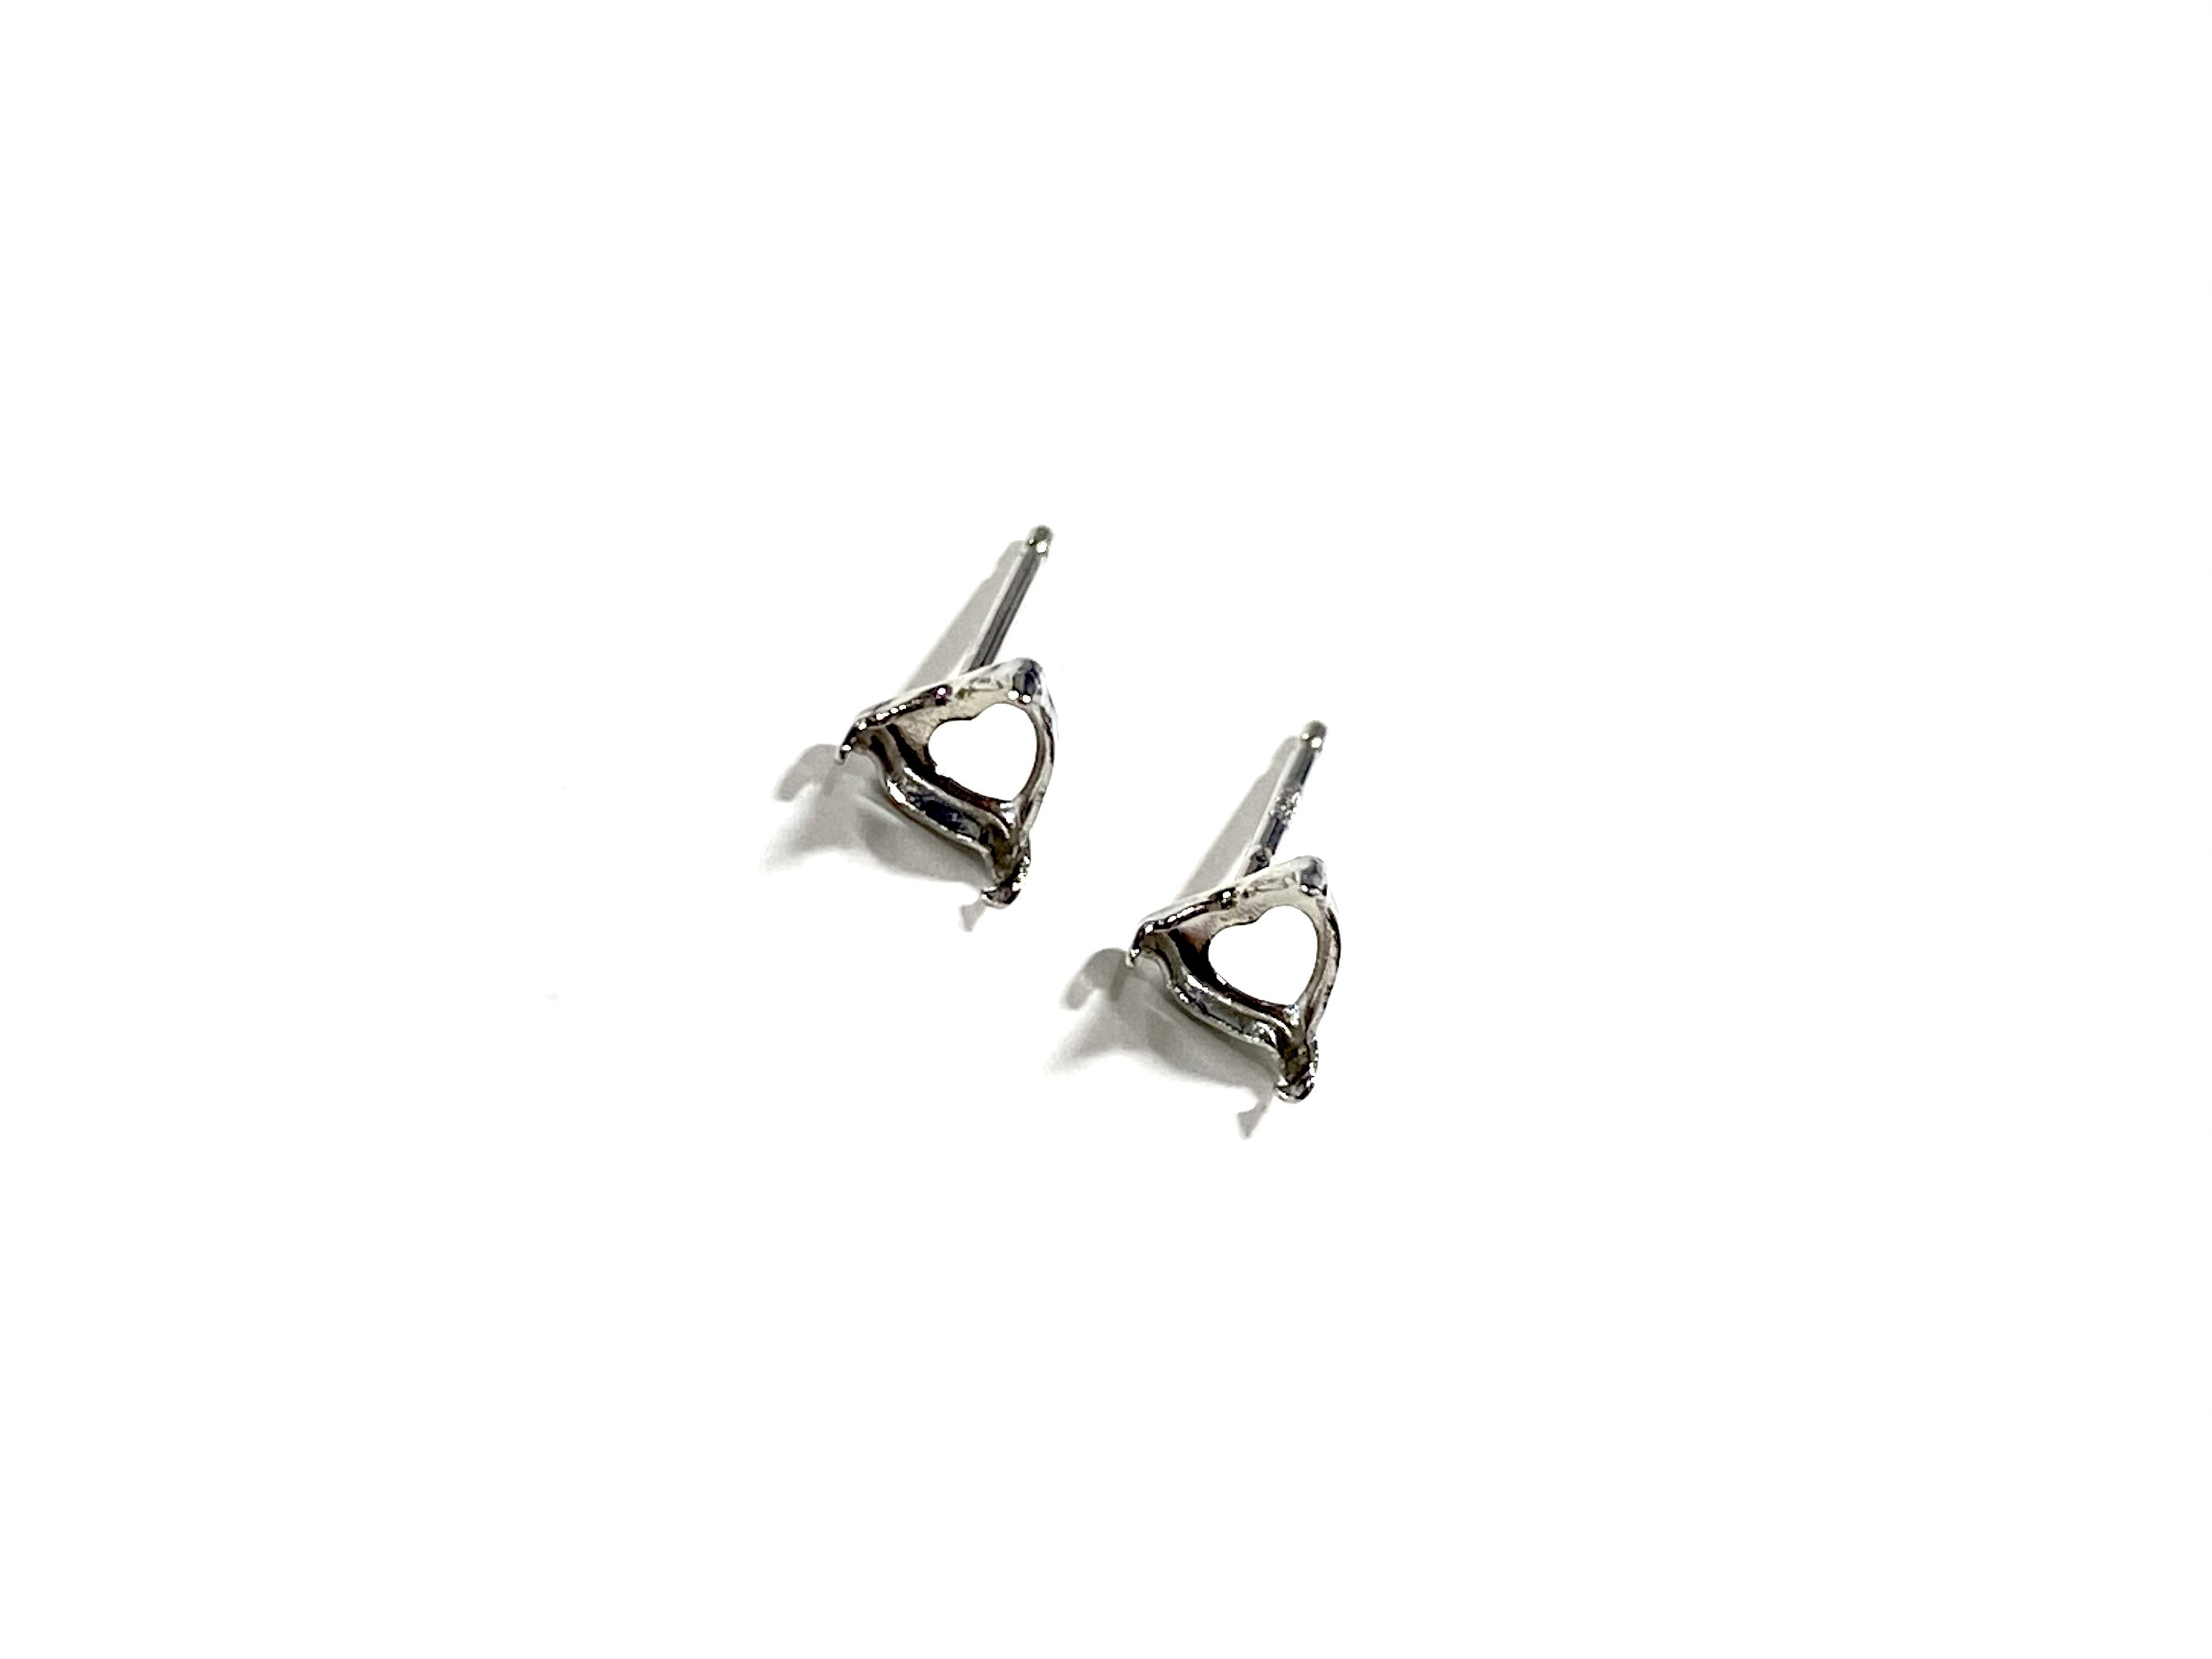 【K10WG】『タテヨコ5mm』ハートシェイプカット対応ピアス空枠 [空枠No,49]